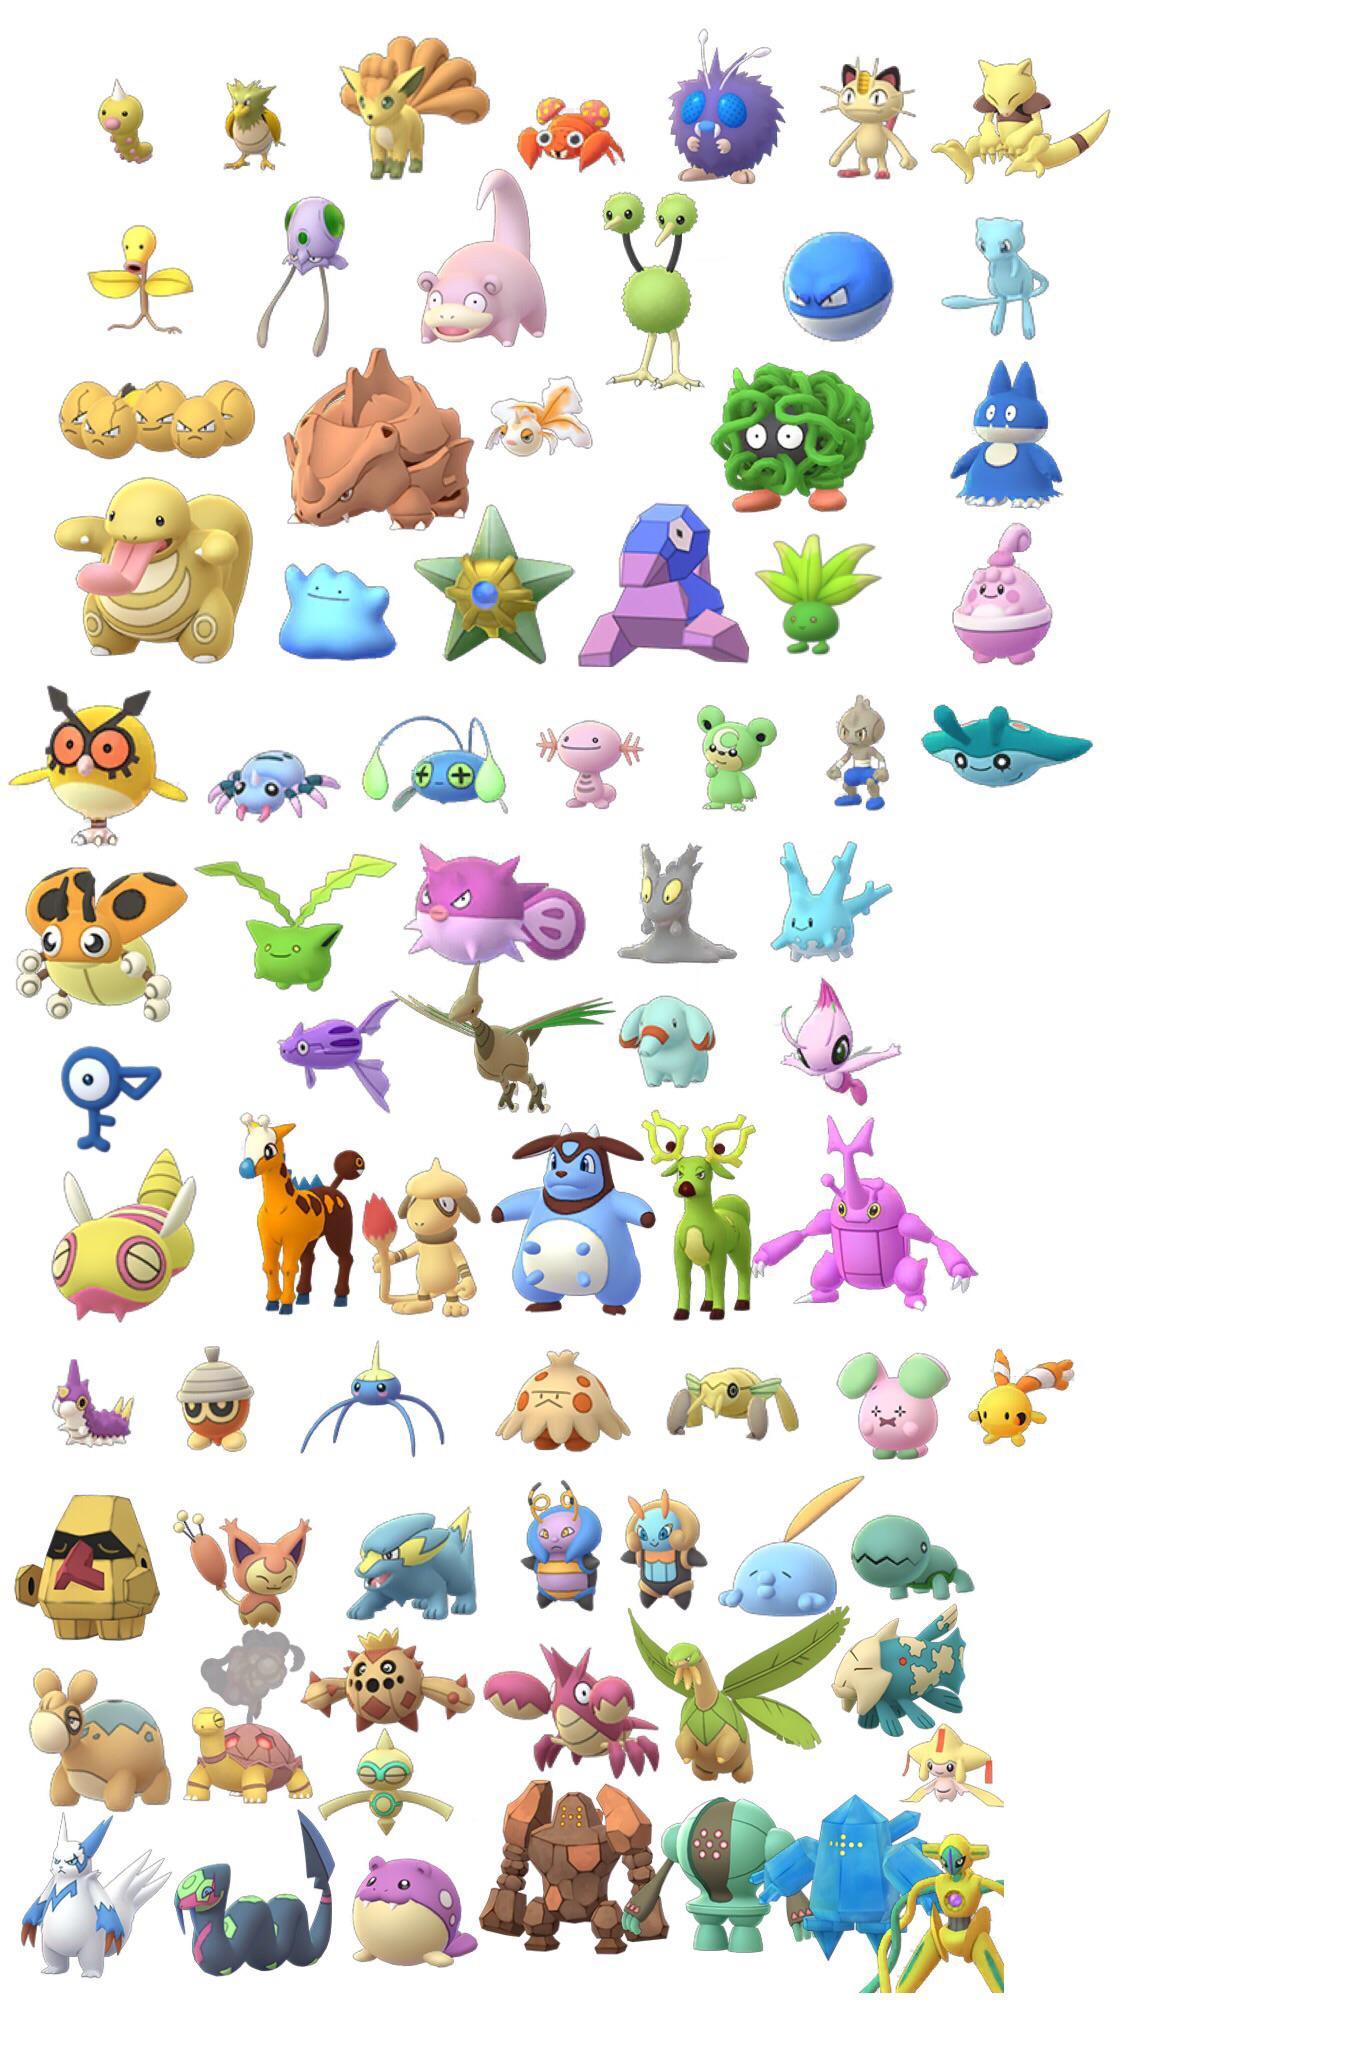 all unreleased shiny pokémon